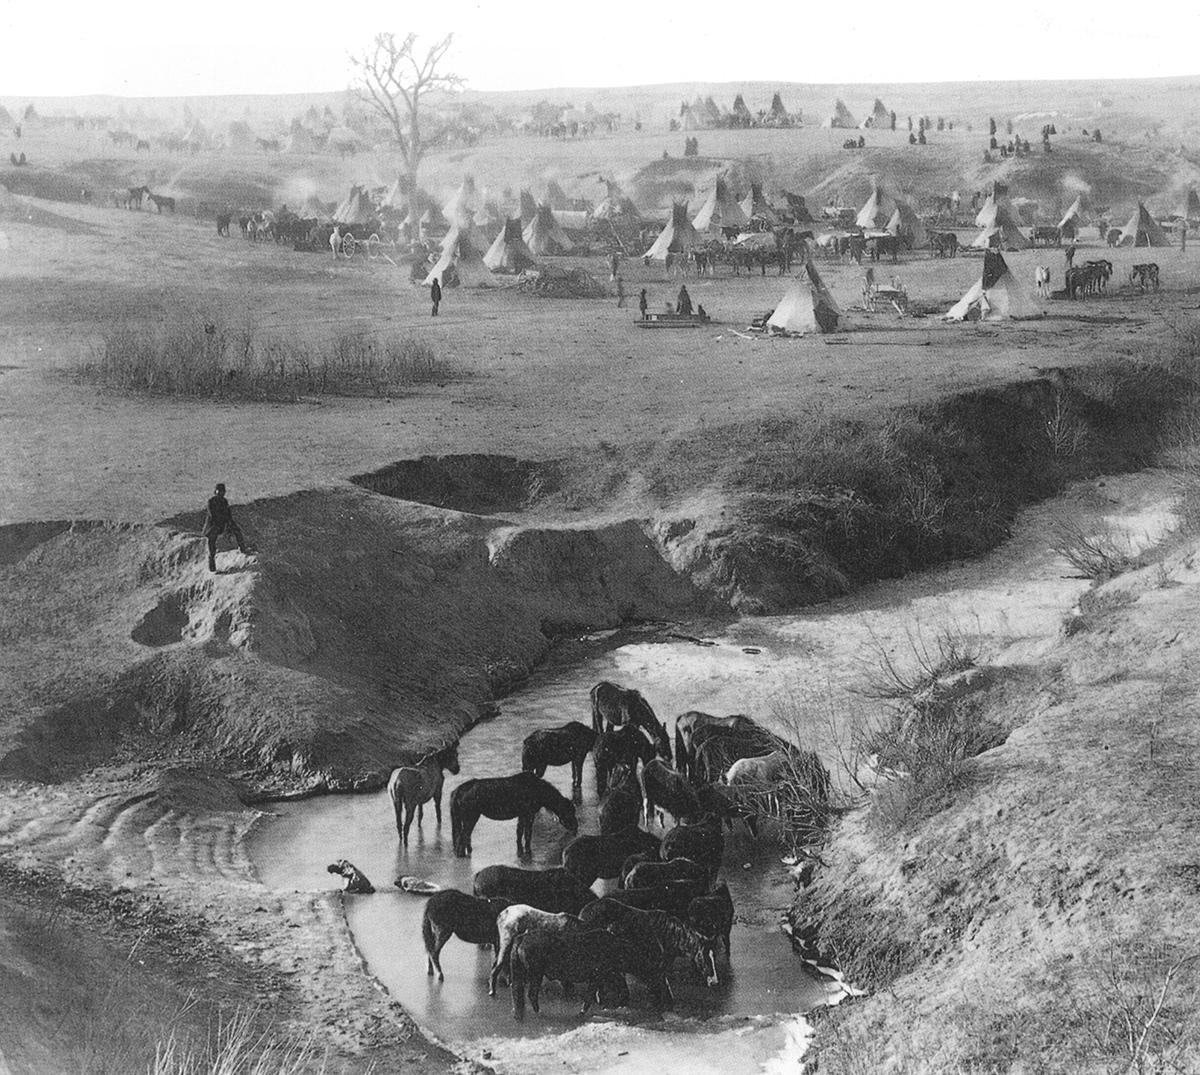 Indian Village on Plains